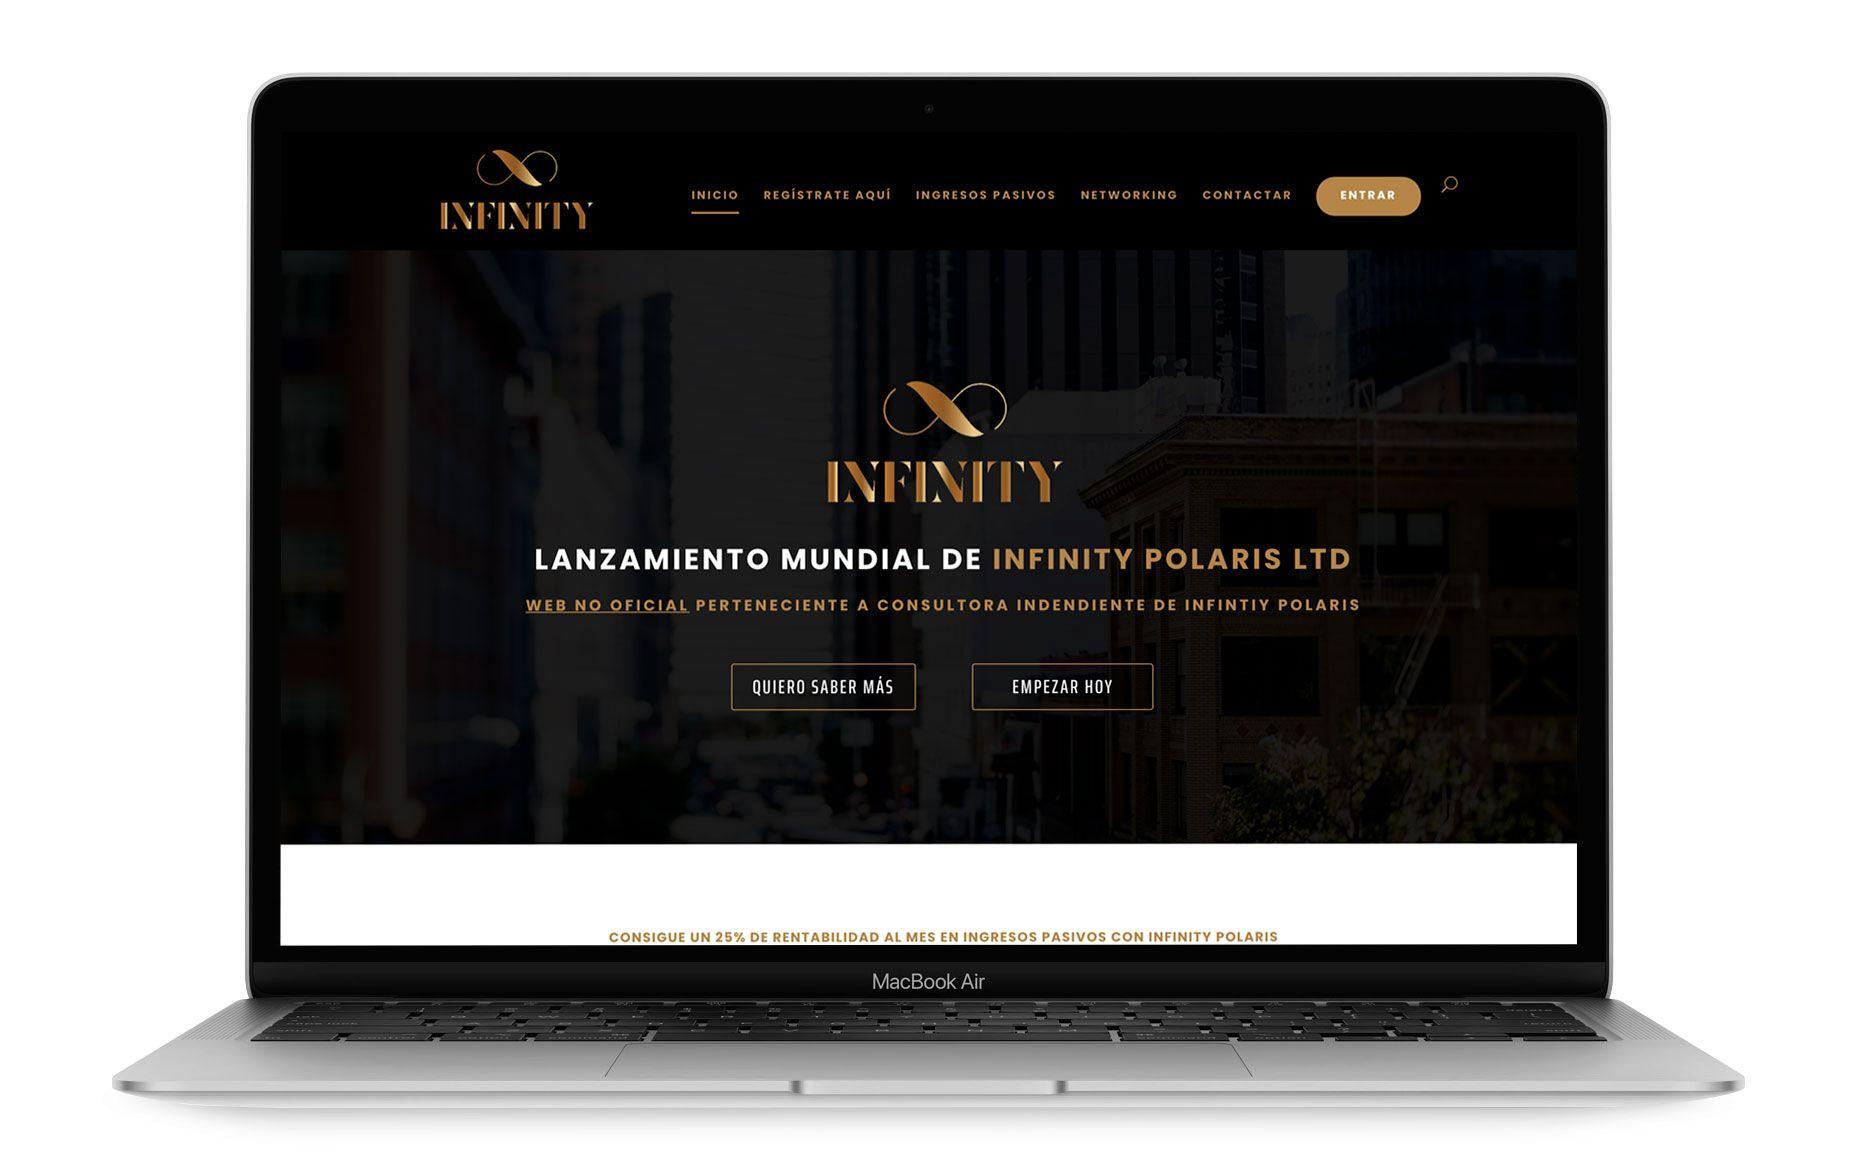 Diseño web de infinitynetwork.online - Infinity Polaris